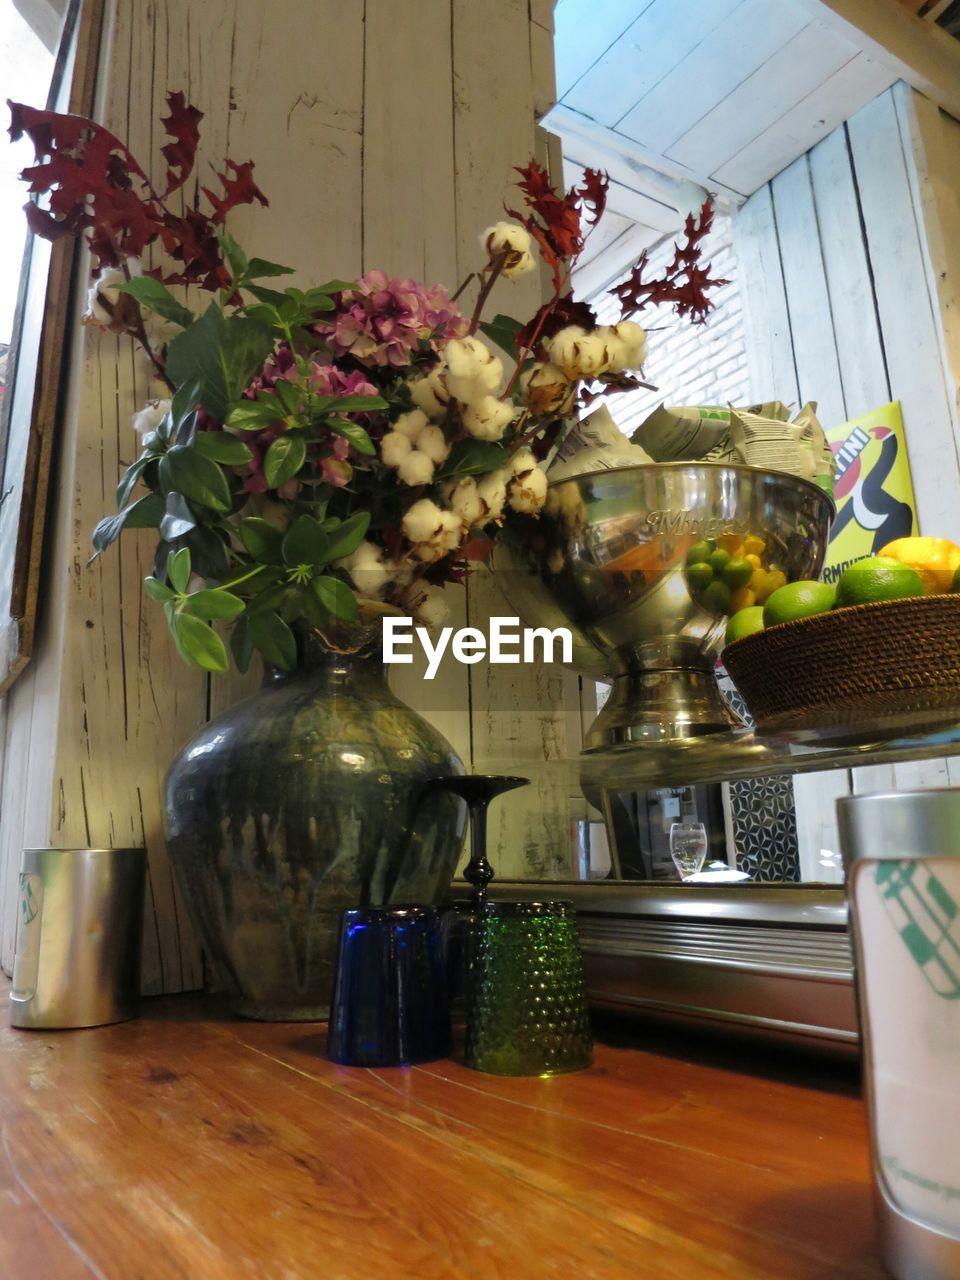 flower, bottle, vase, table, indoors, no people, freshness, food, fragility, day, close-up